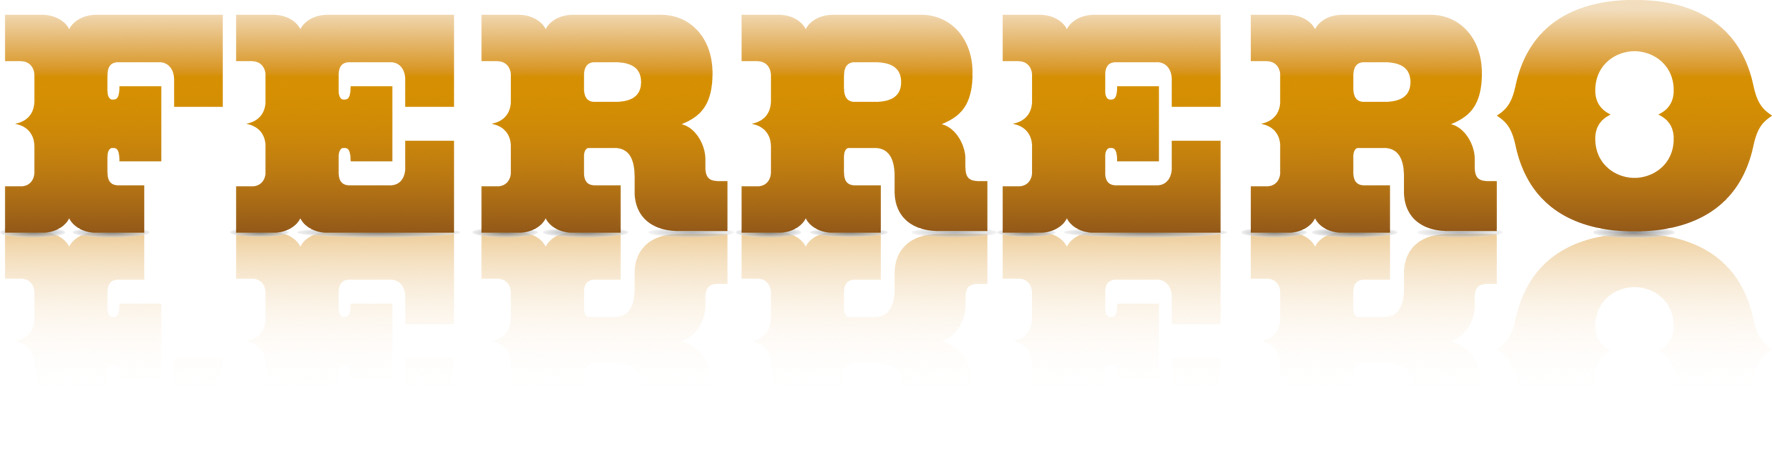 Ferrero_logo.jpg